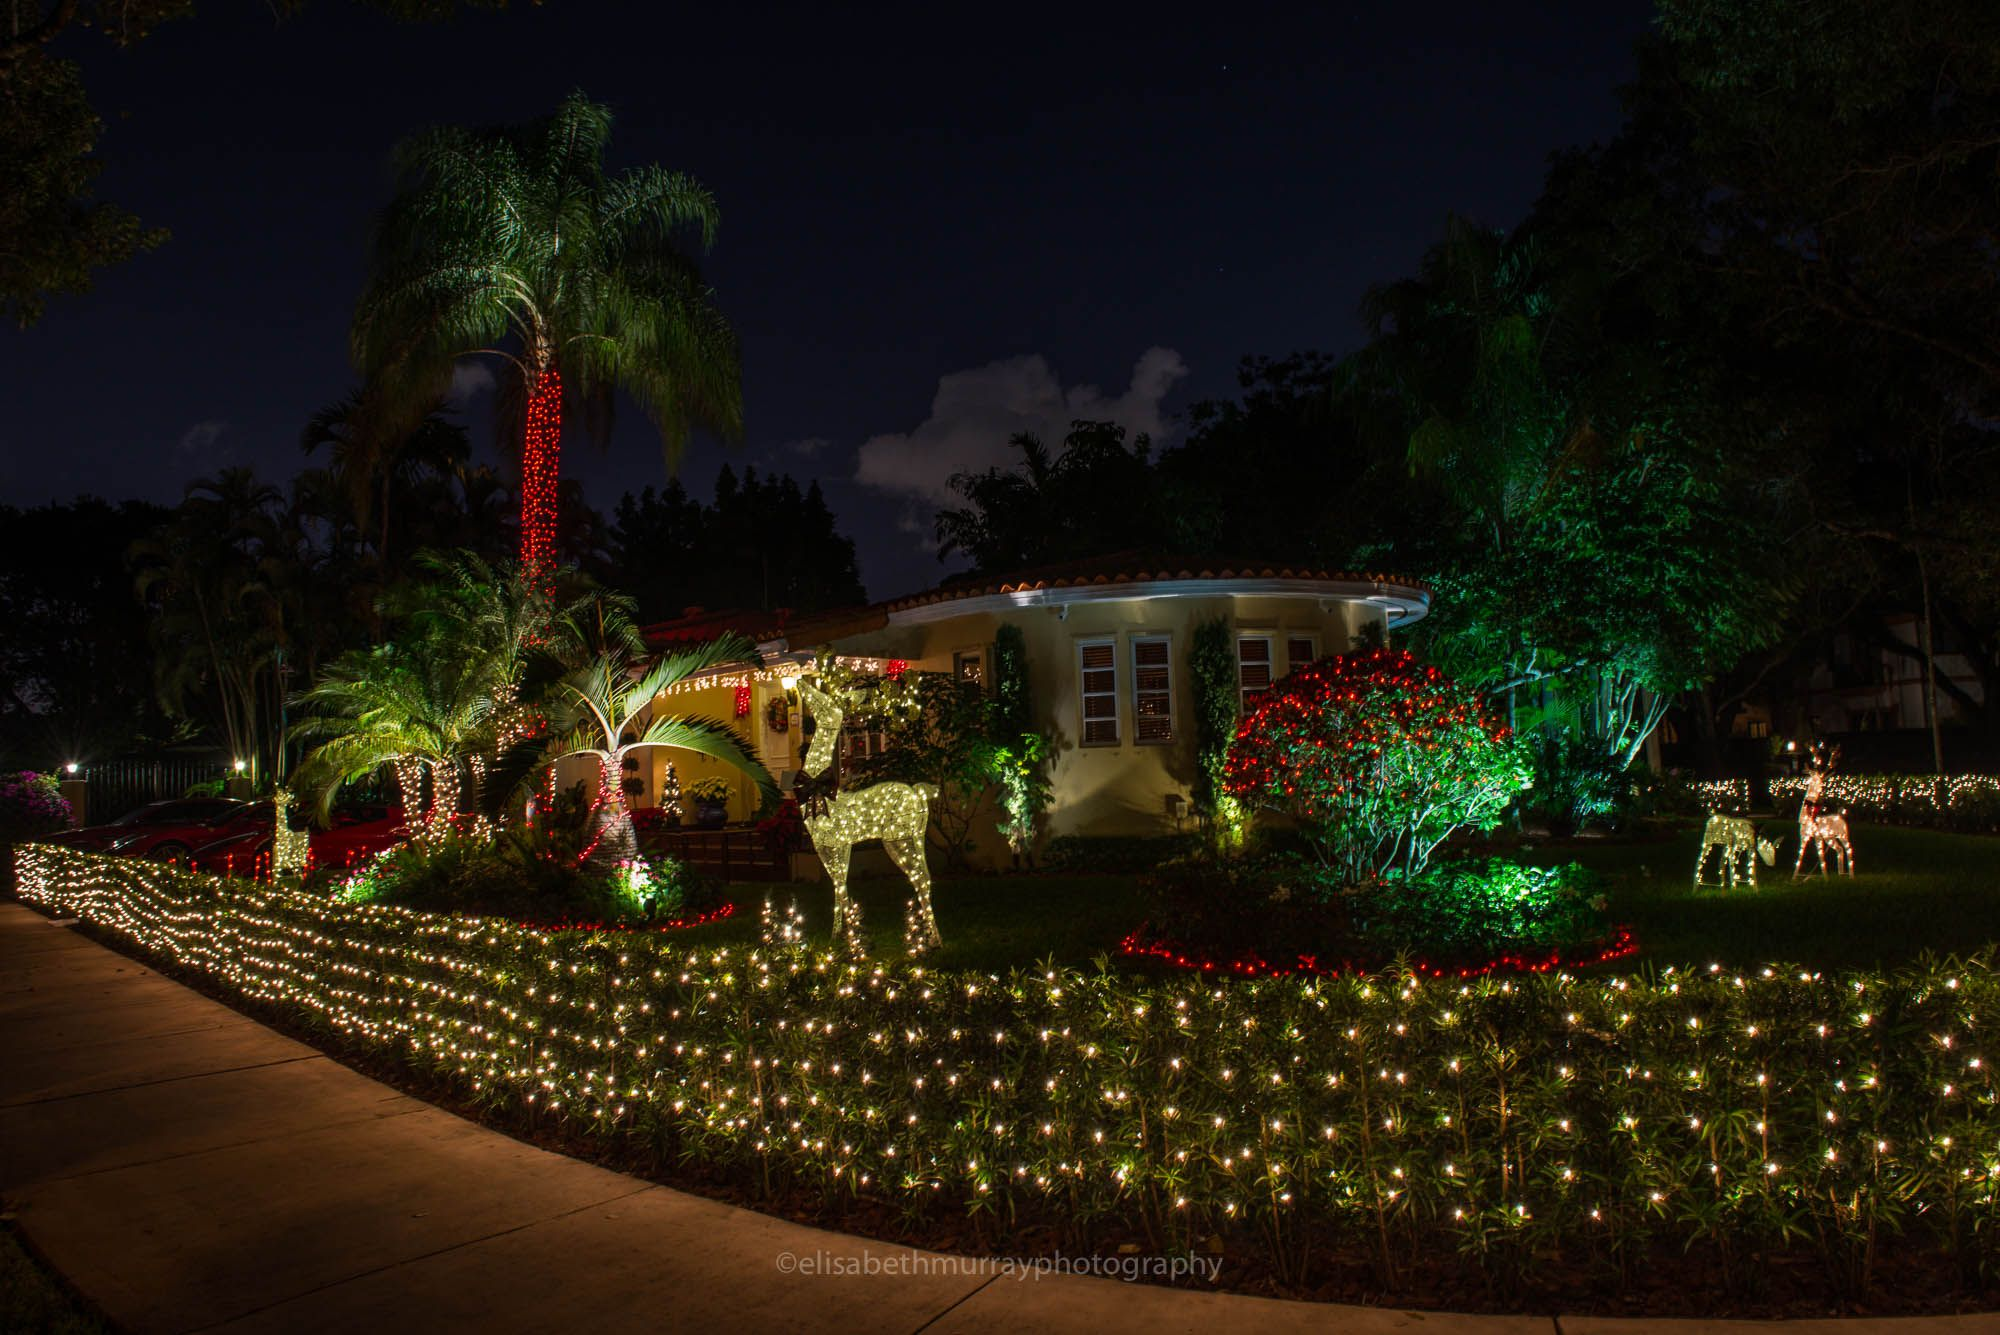 Coral Gables Garden City By Elisabeth Murray